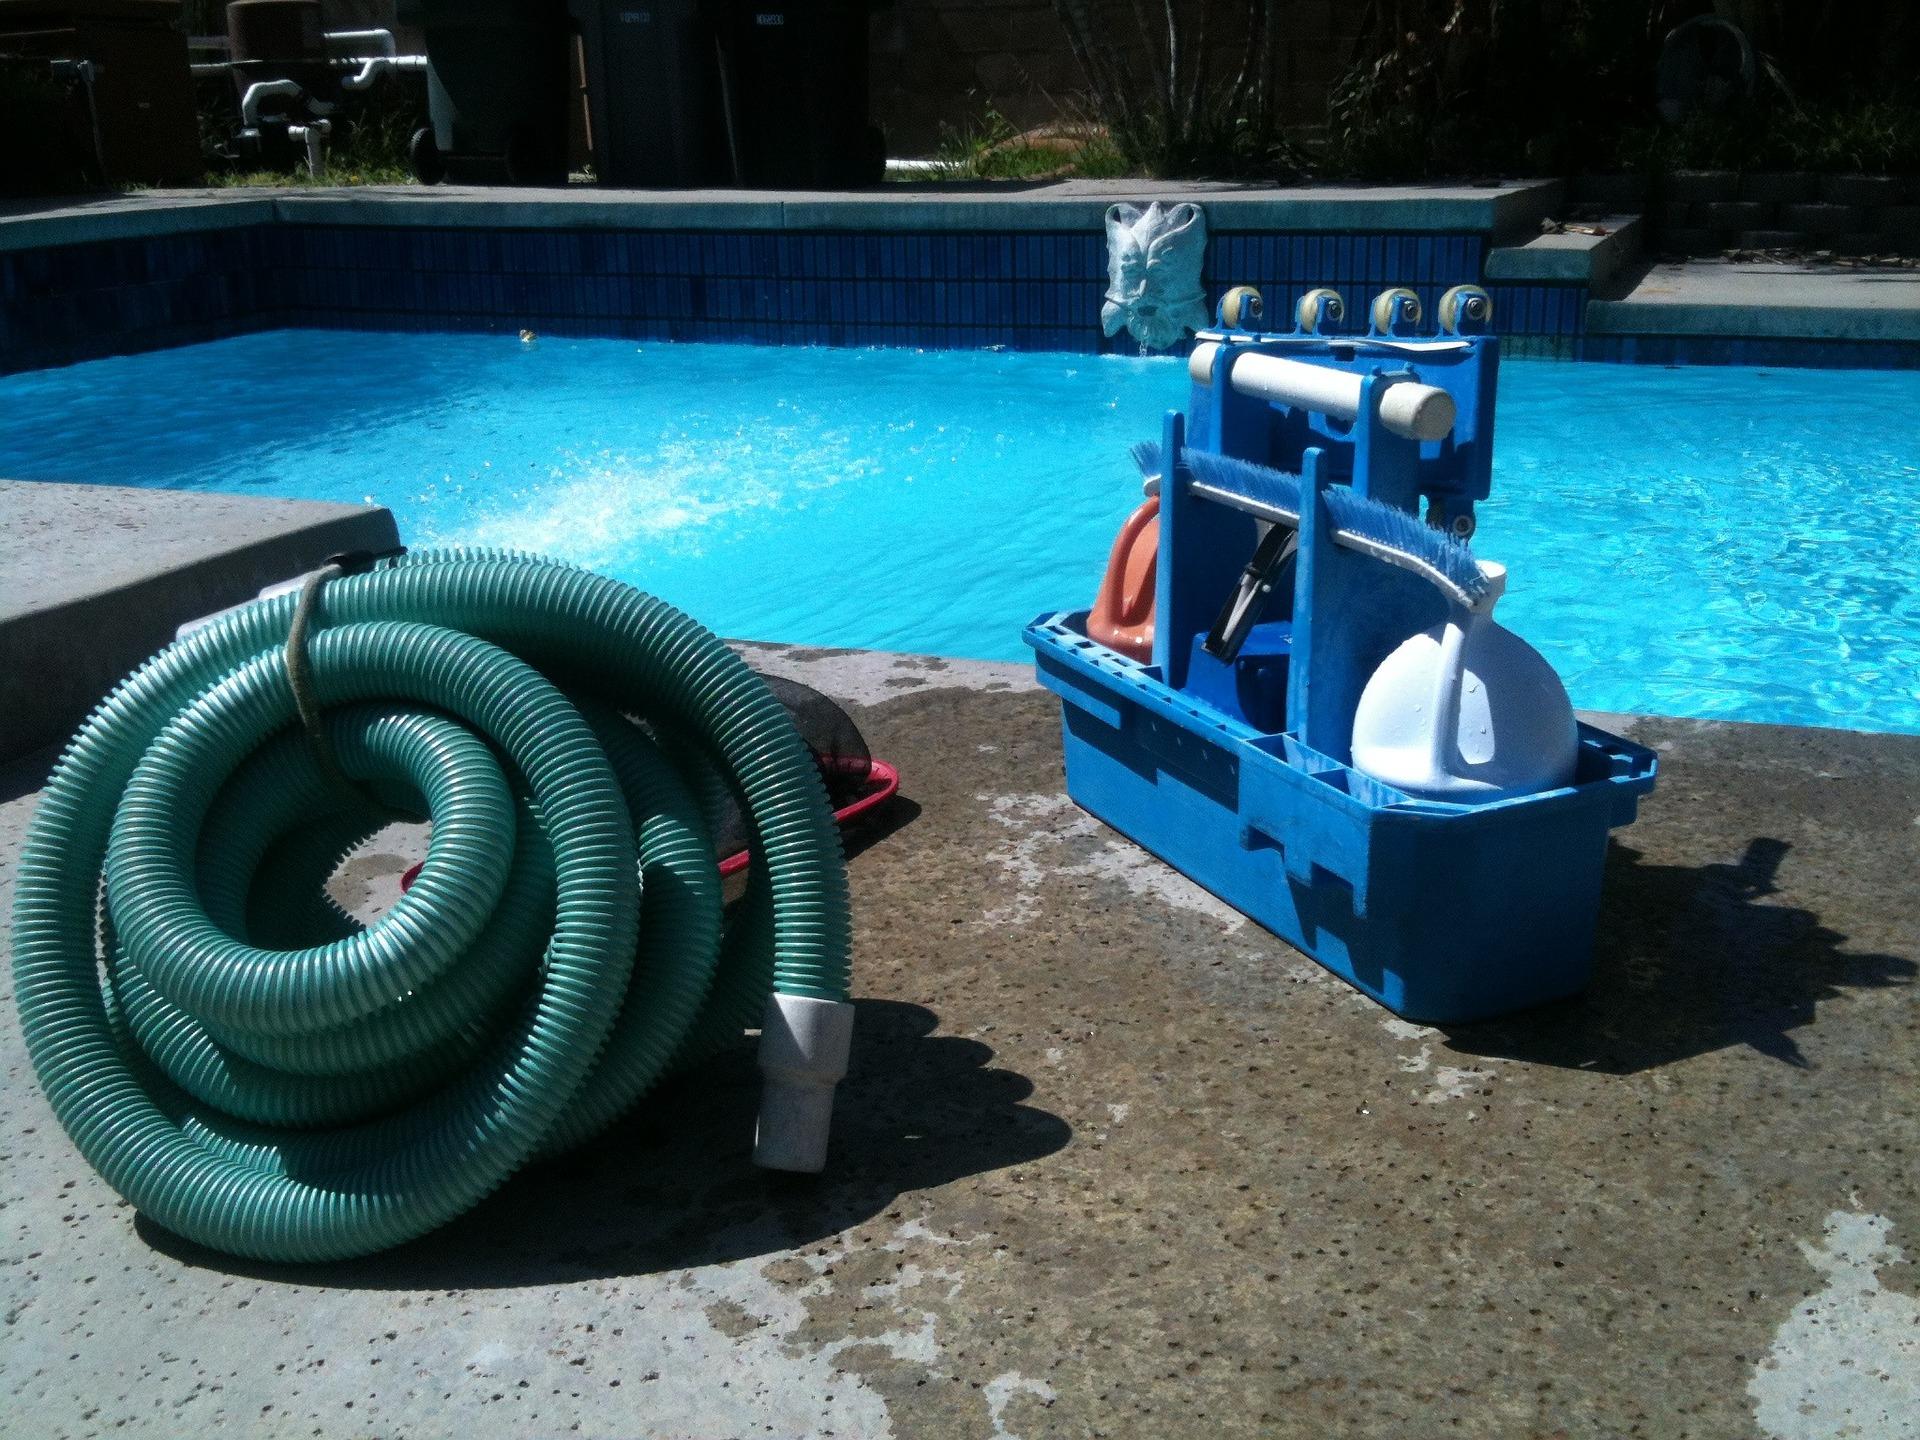 saltwater pool maintenance gear